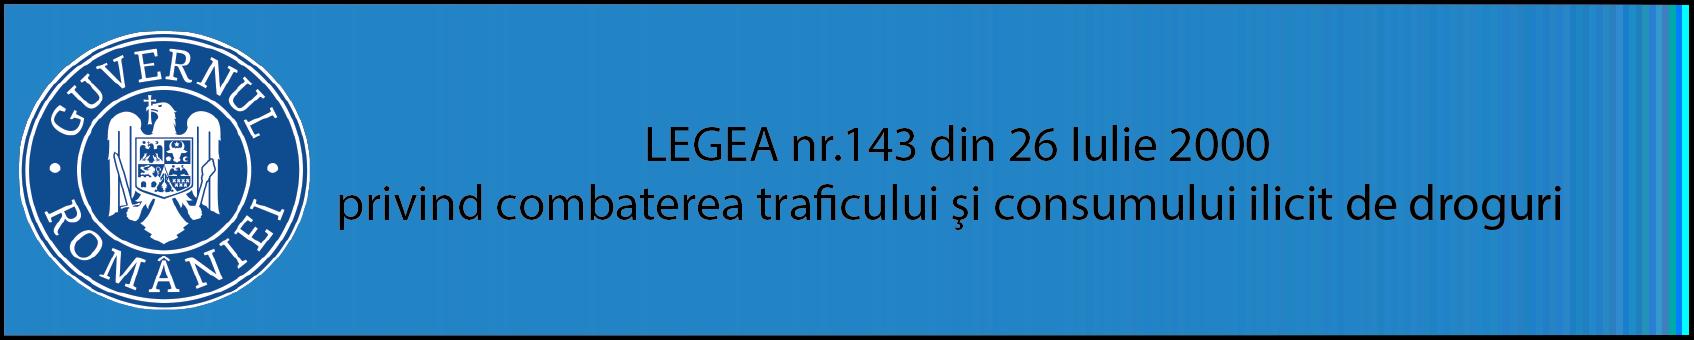 lege2